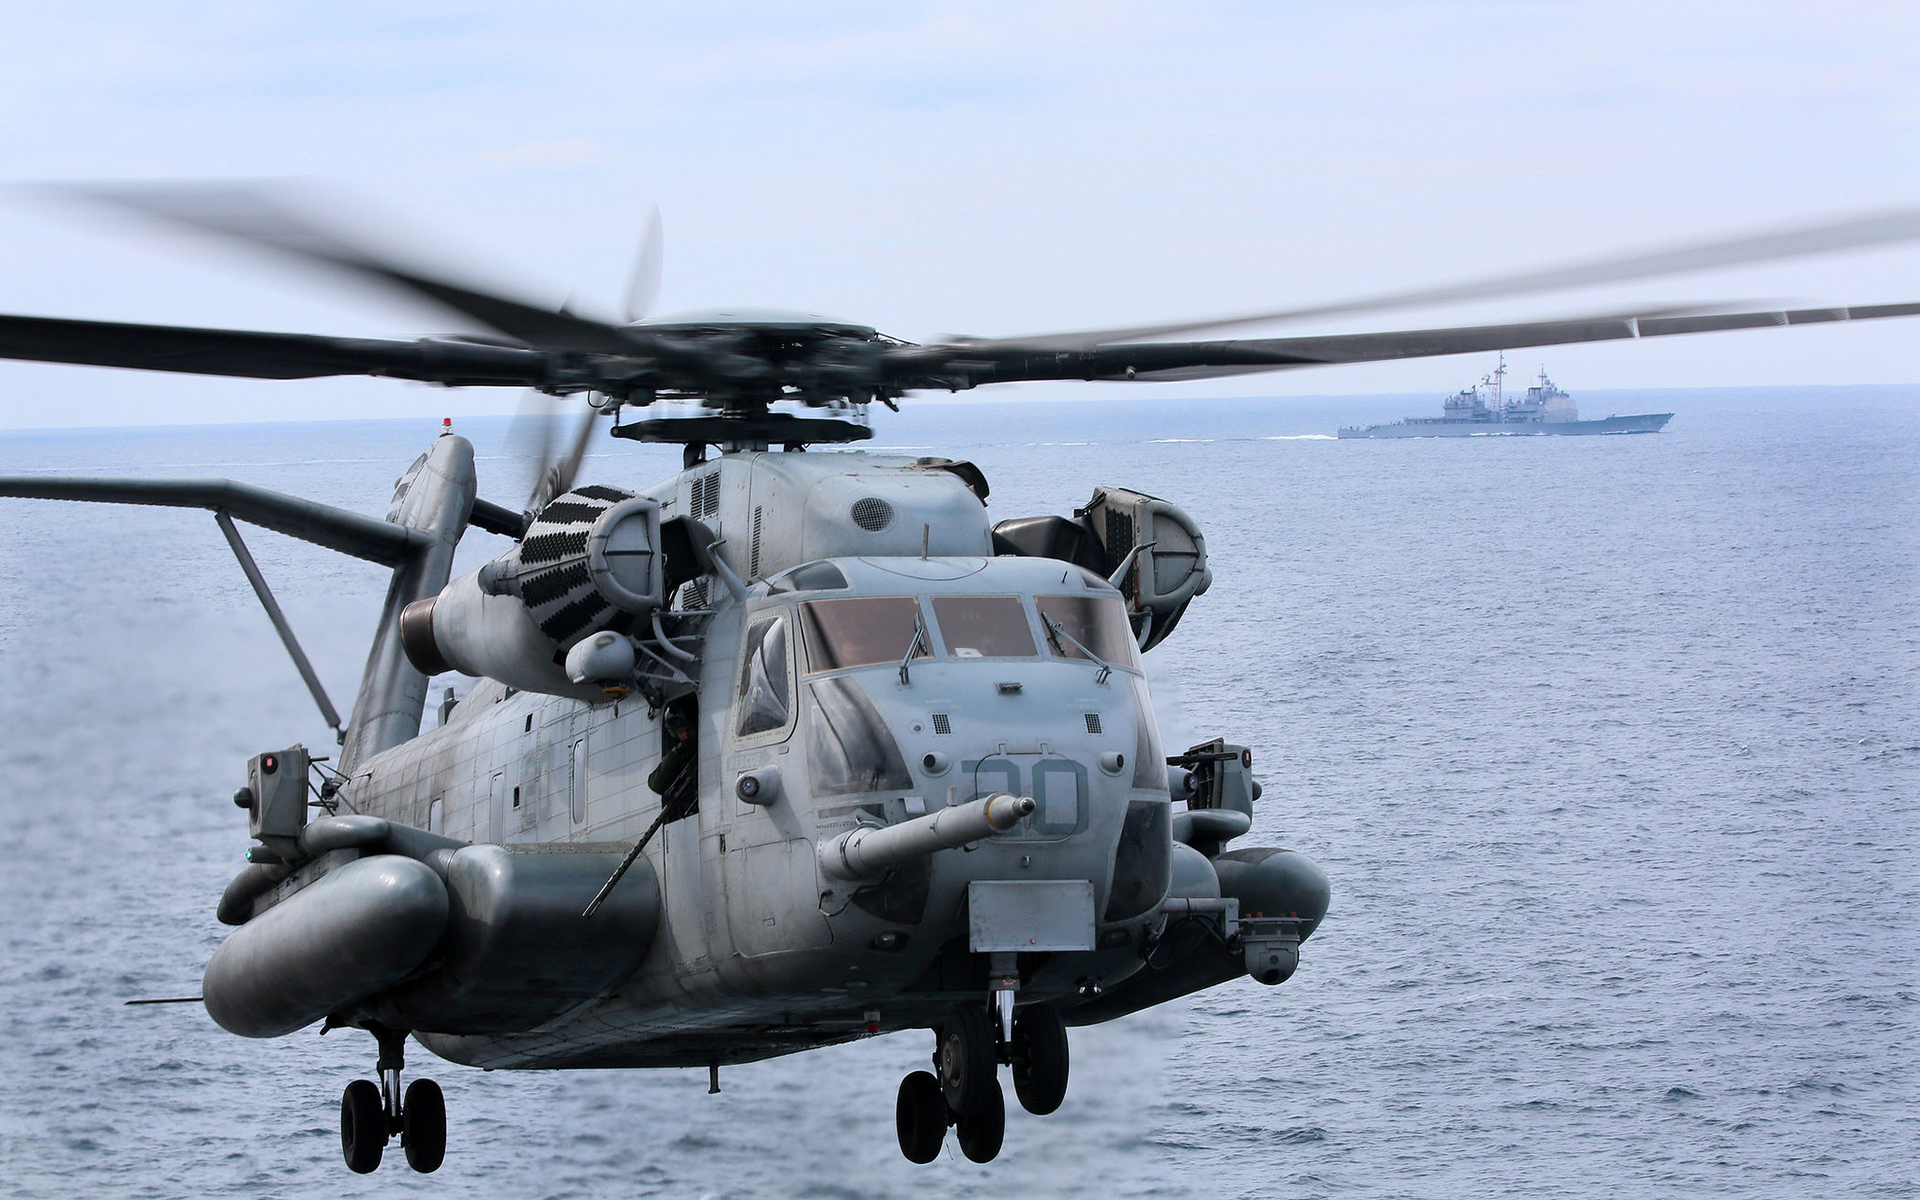 Sikorsky CH-53 Sea Stallion HD Wallpaper